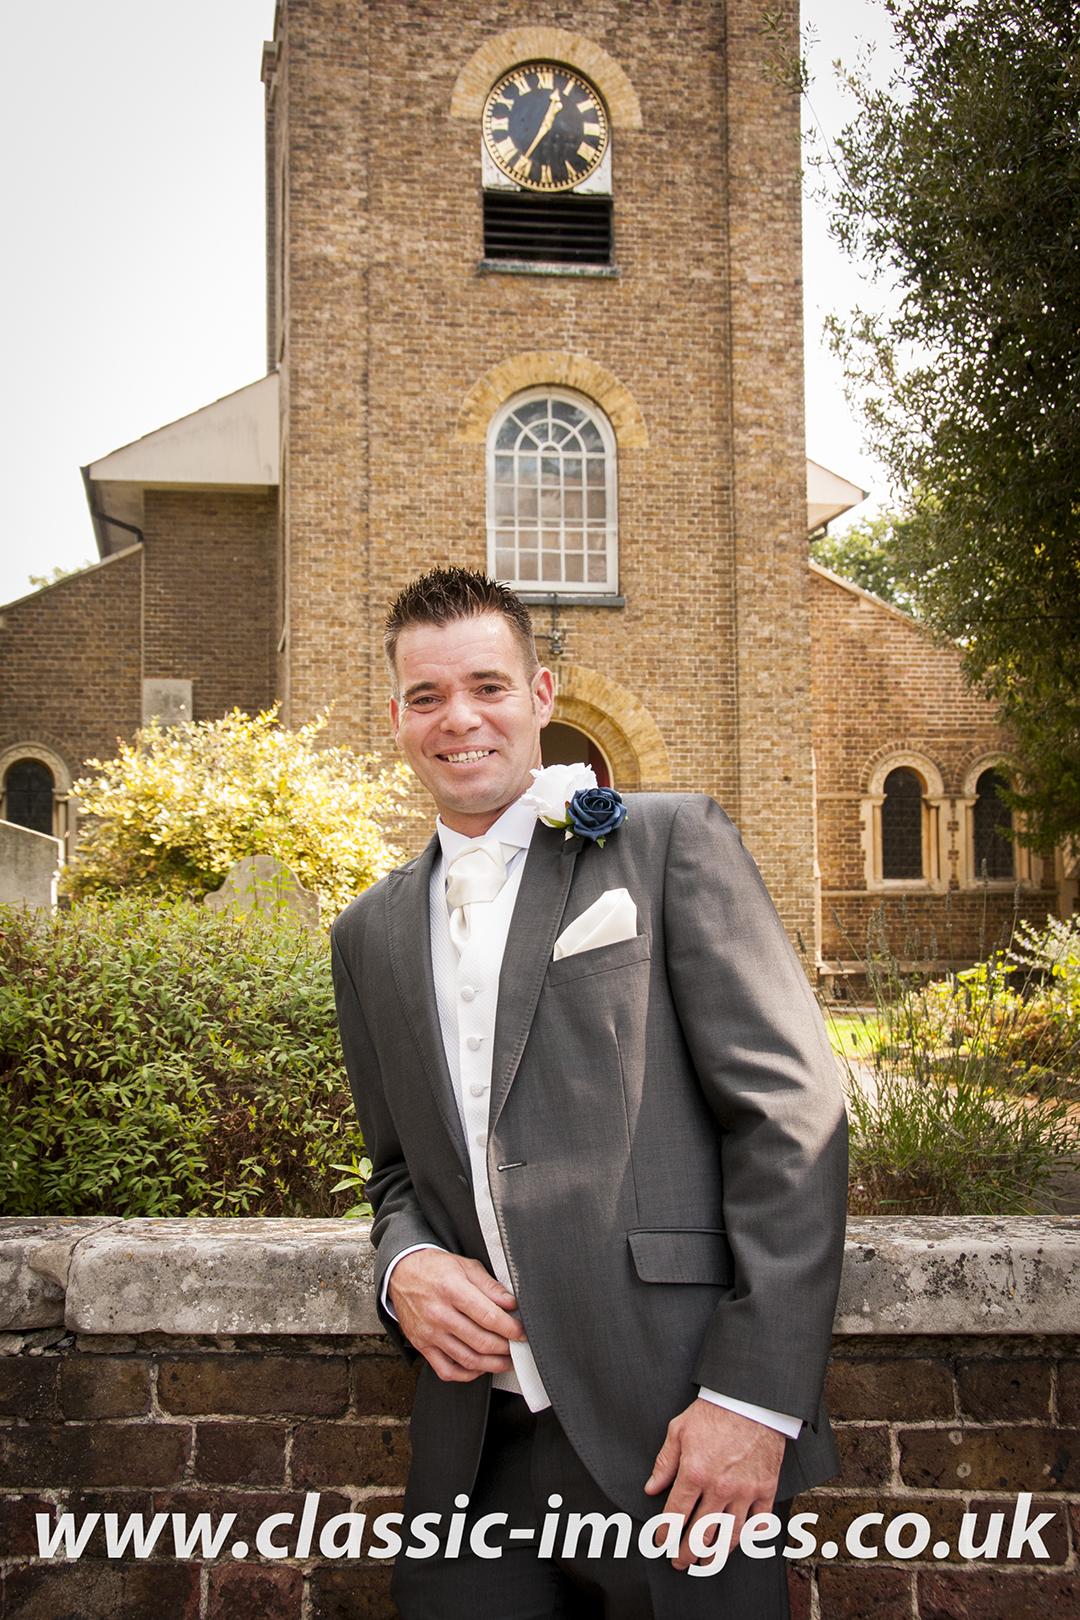 ceremony-groom-classic-images-sunbury